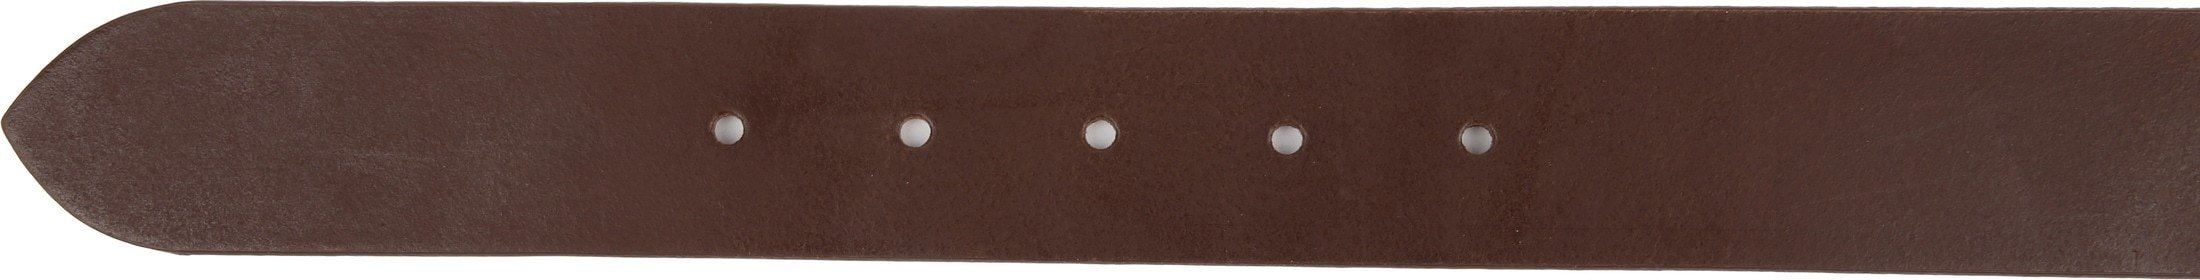 Levi's  Lev 8 Leather Belt Brown foto 2